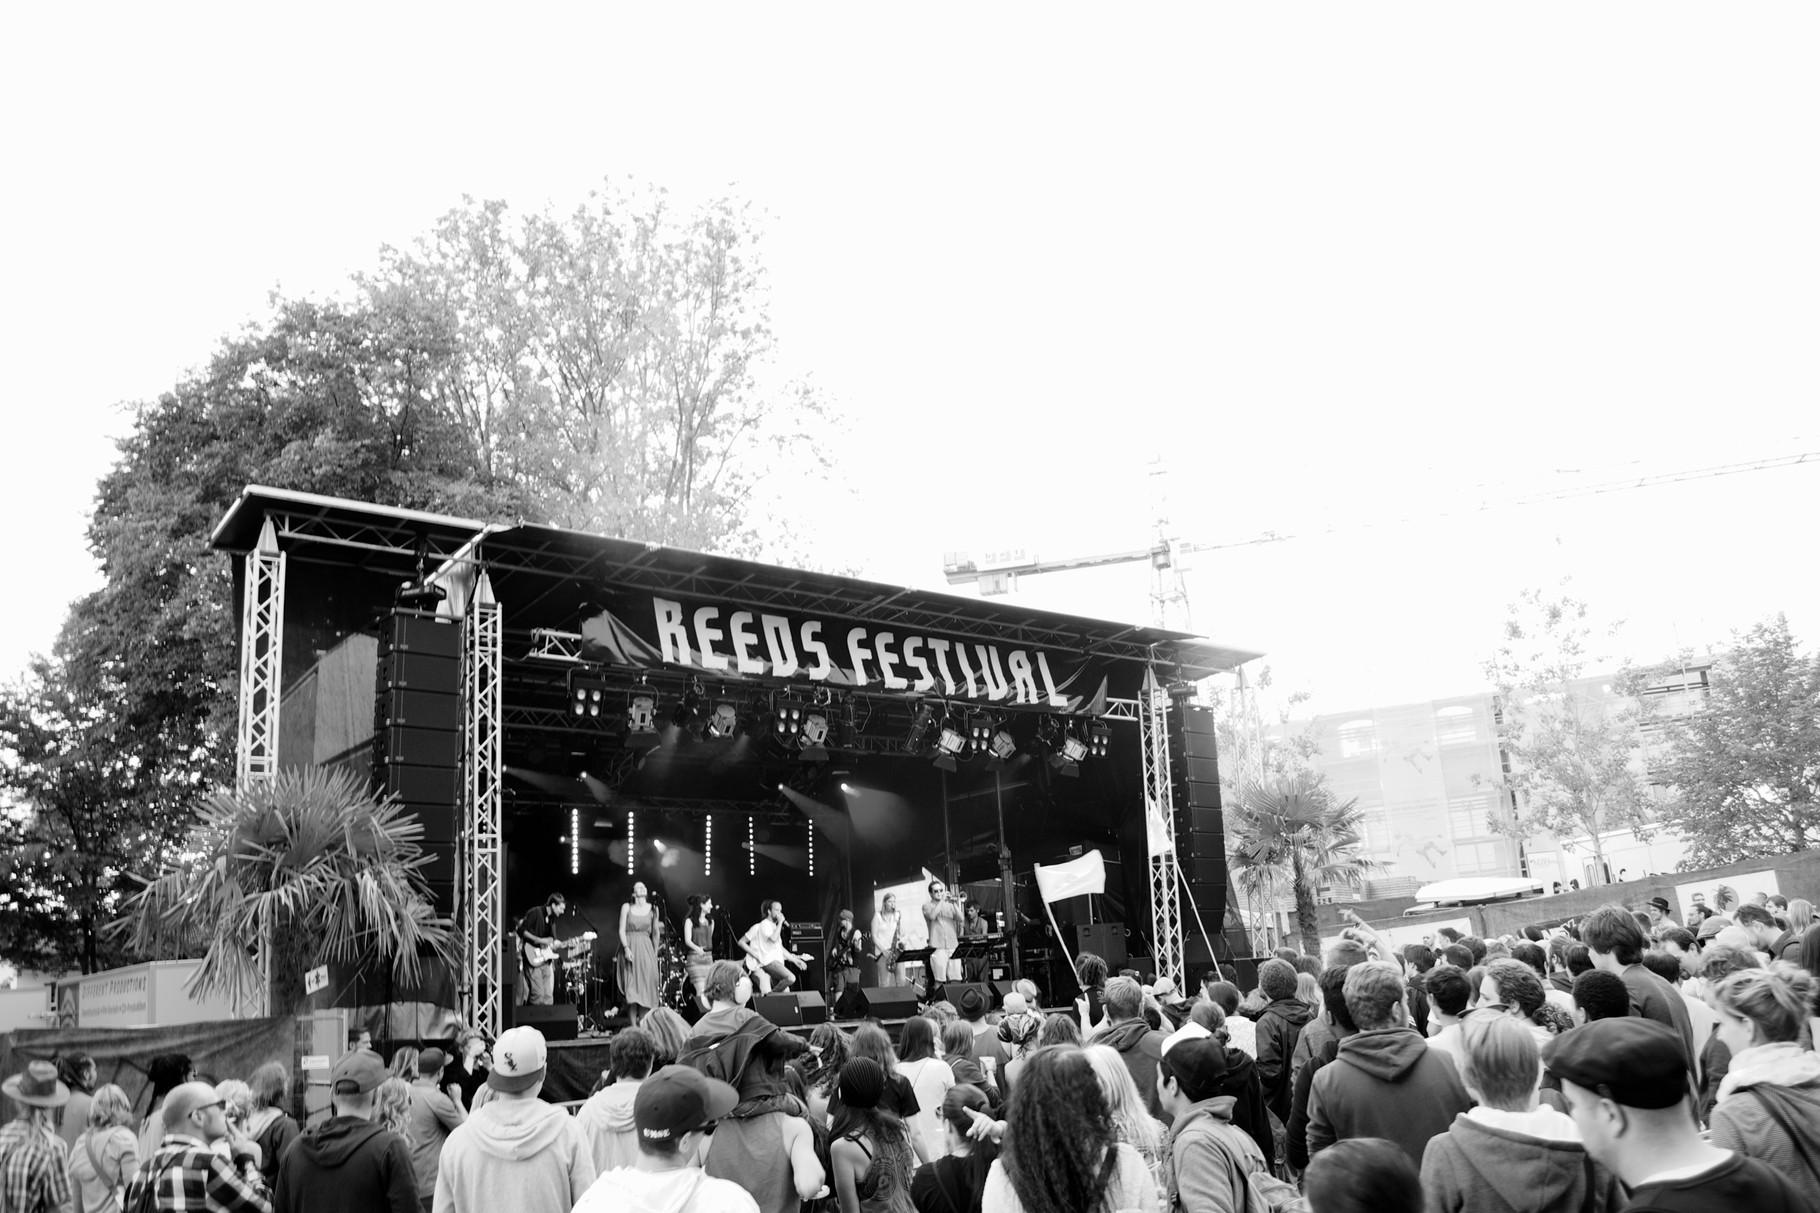 Reeds Festival 2015